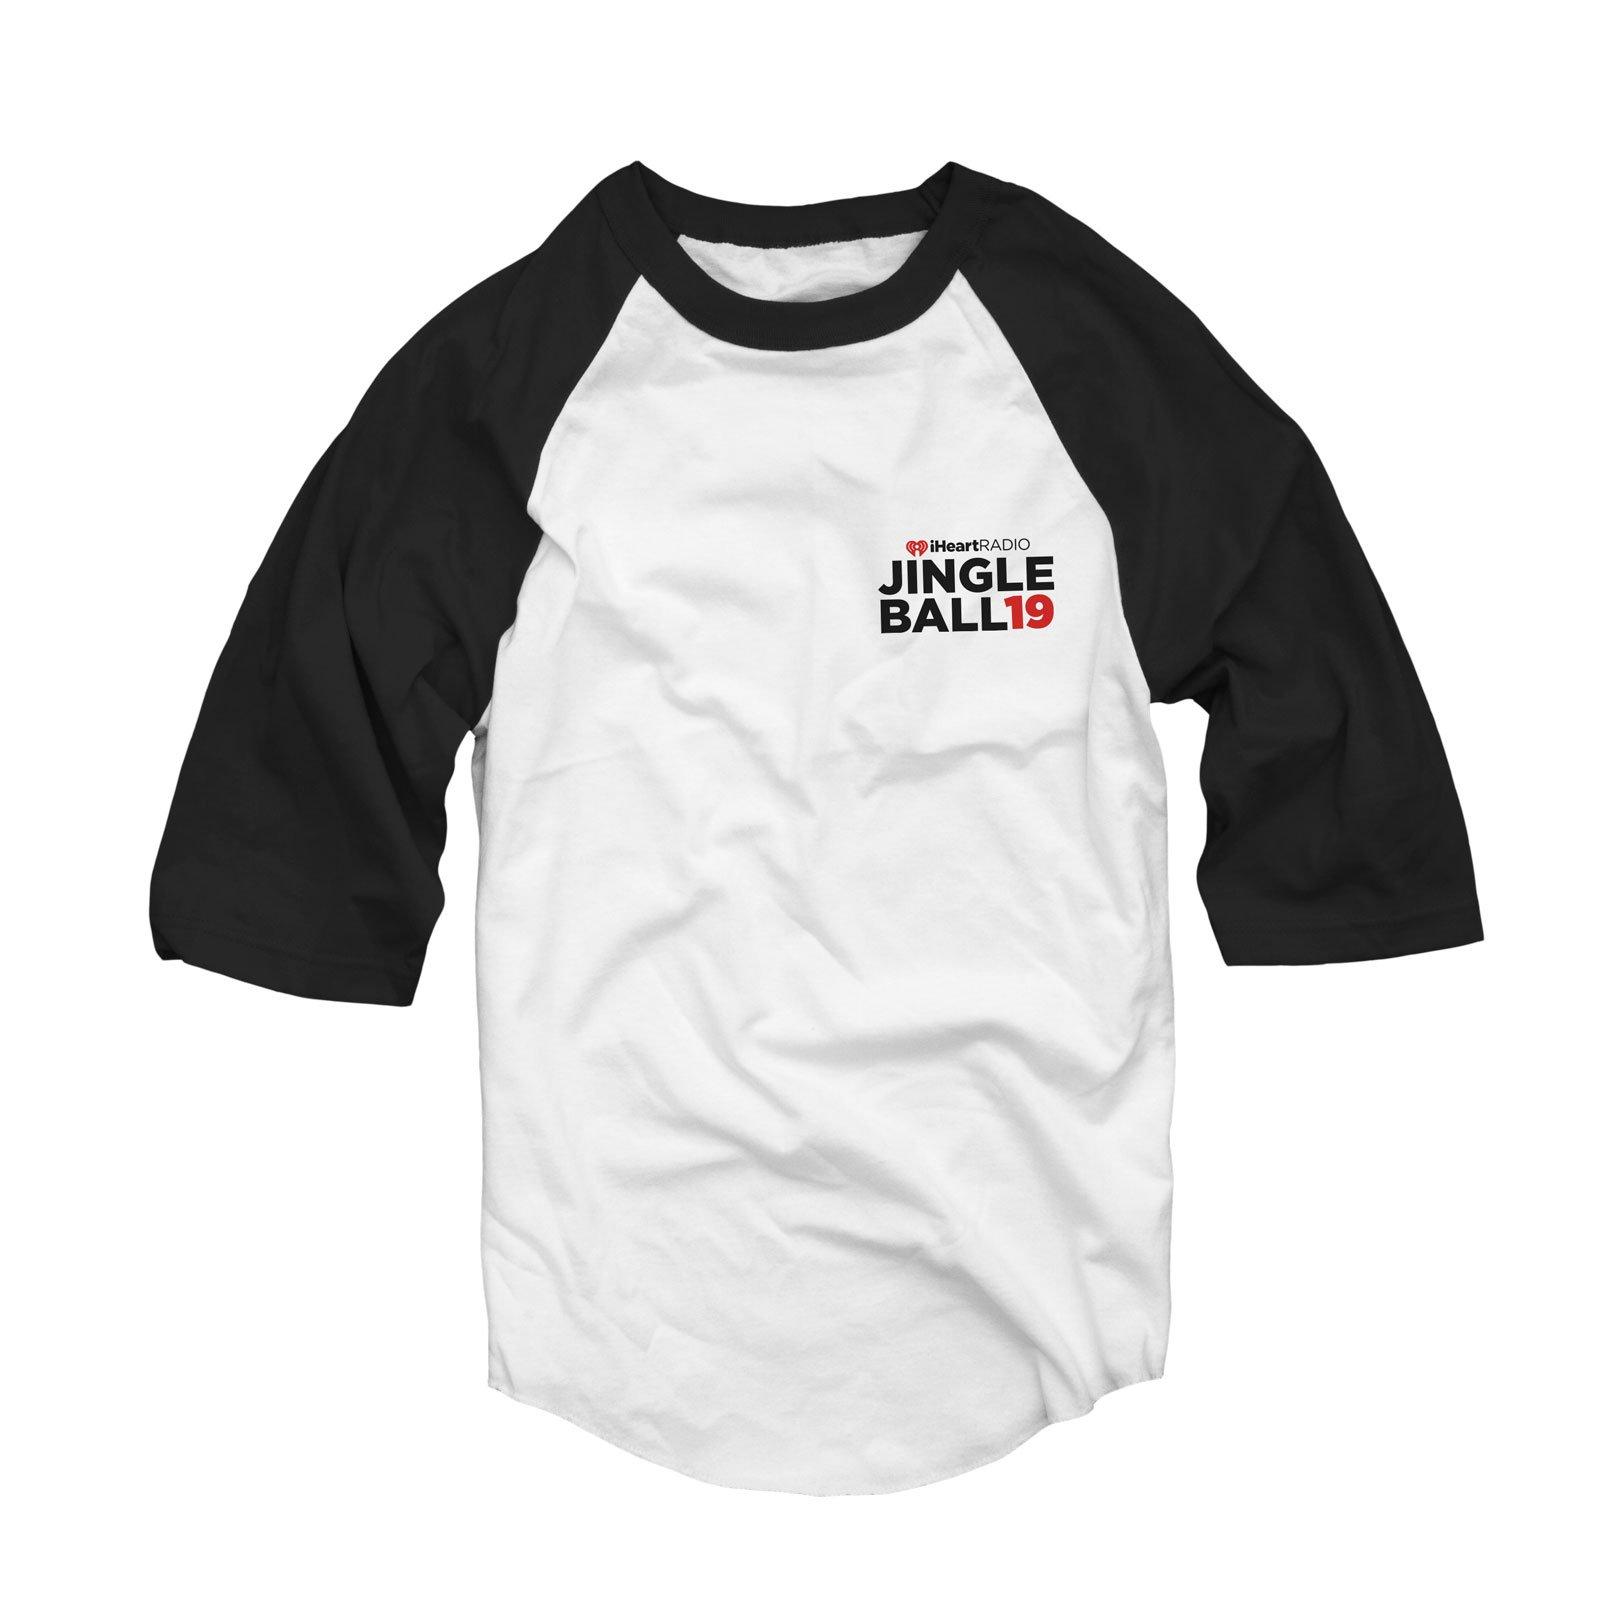 JB19 Tour Baseball Shirt